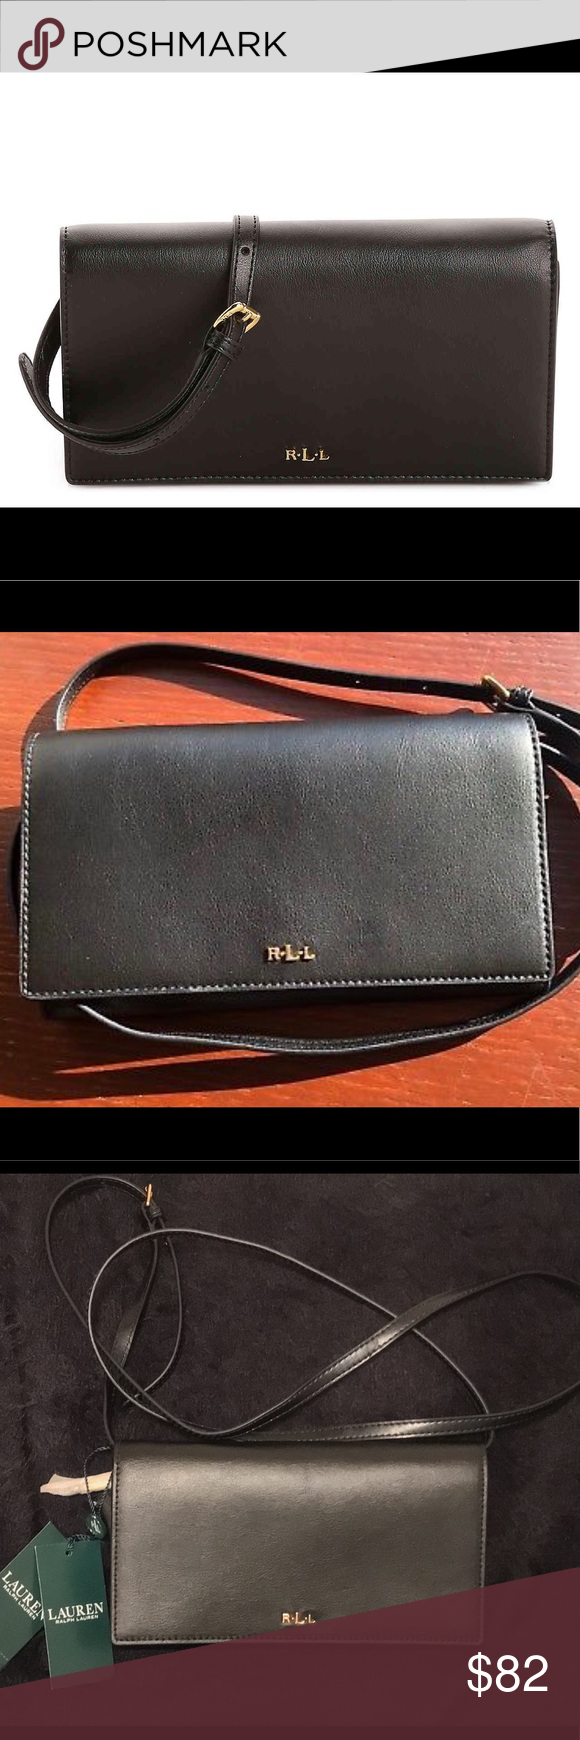 63a94abf08 Ralph Lauren Black Leather Crossbody Wallet Purse Lauren Ralph Lauren Dowell  Xbody Leather Bag. Brand